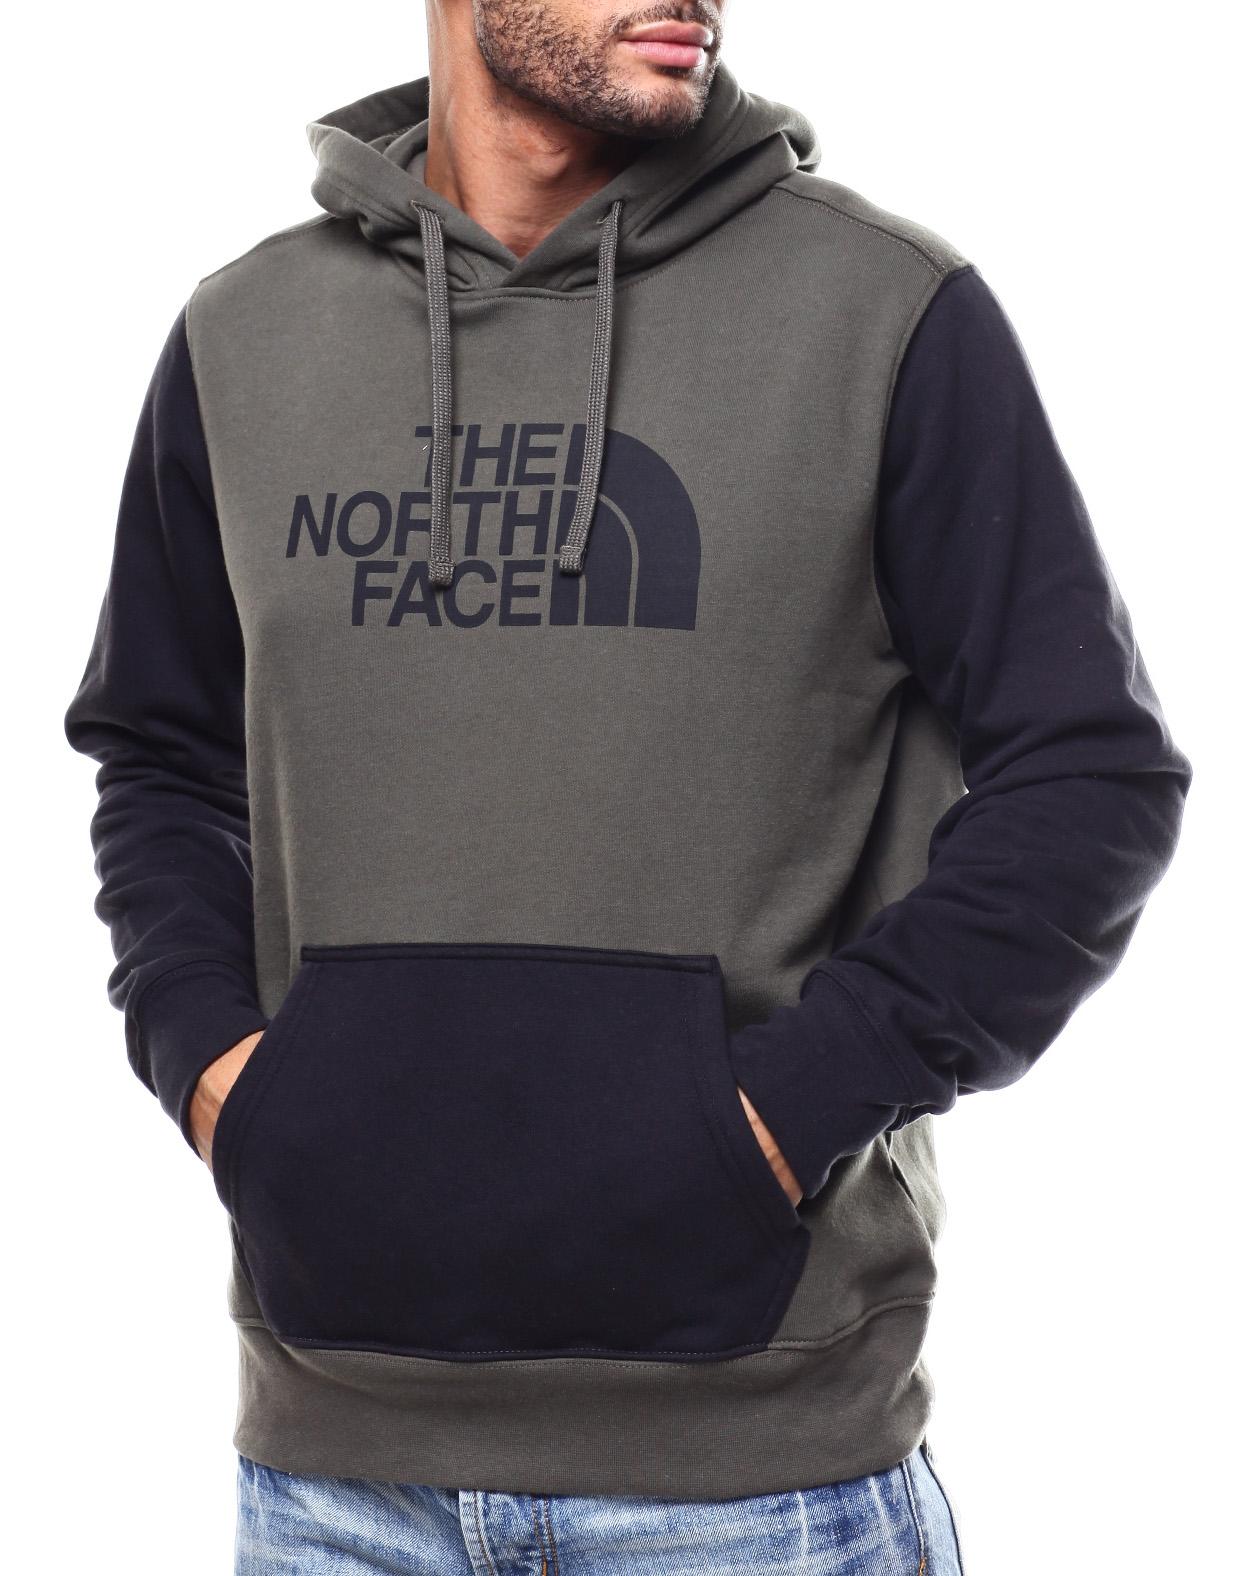 cf0d61323 Buy Half Dome COLORBLOCK Pullover Hoodie Men's Hoodies from The ...